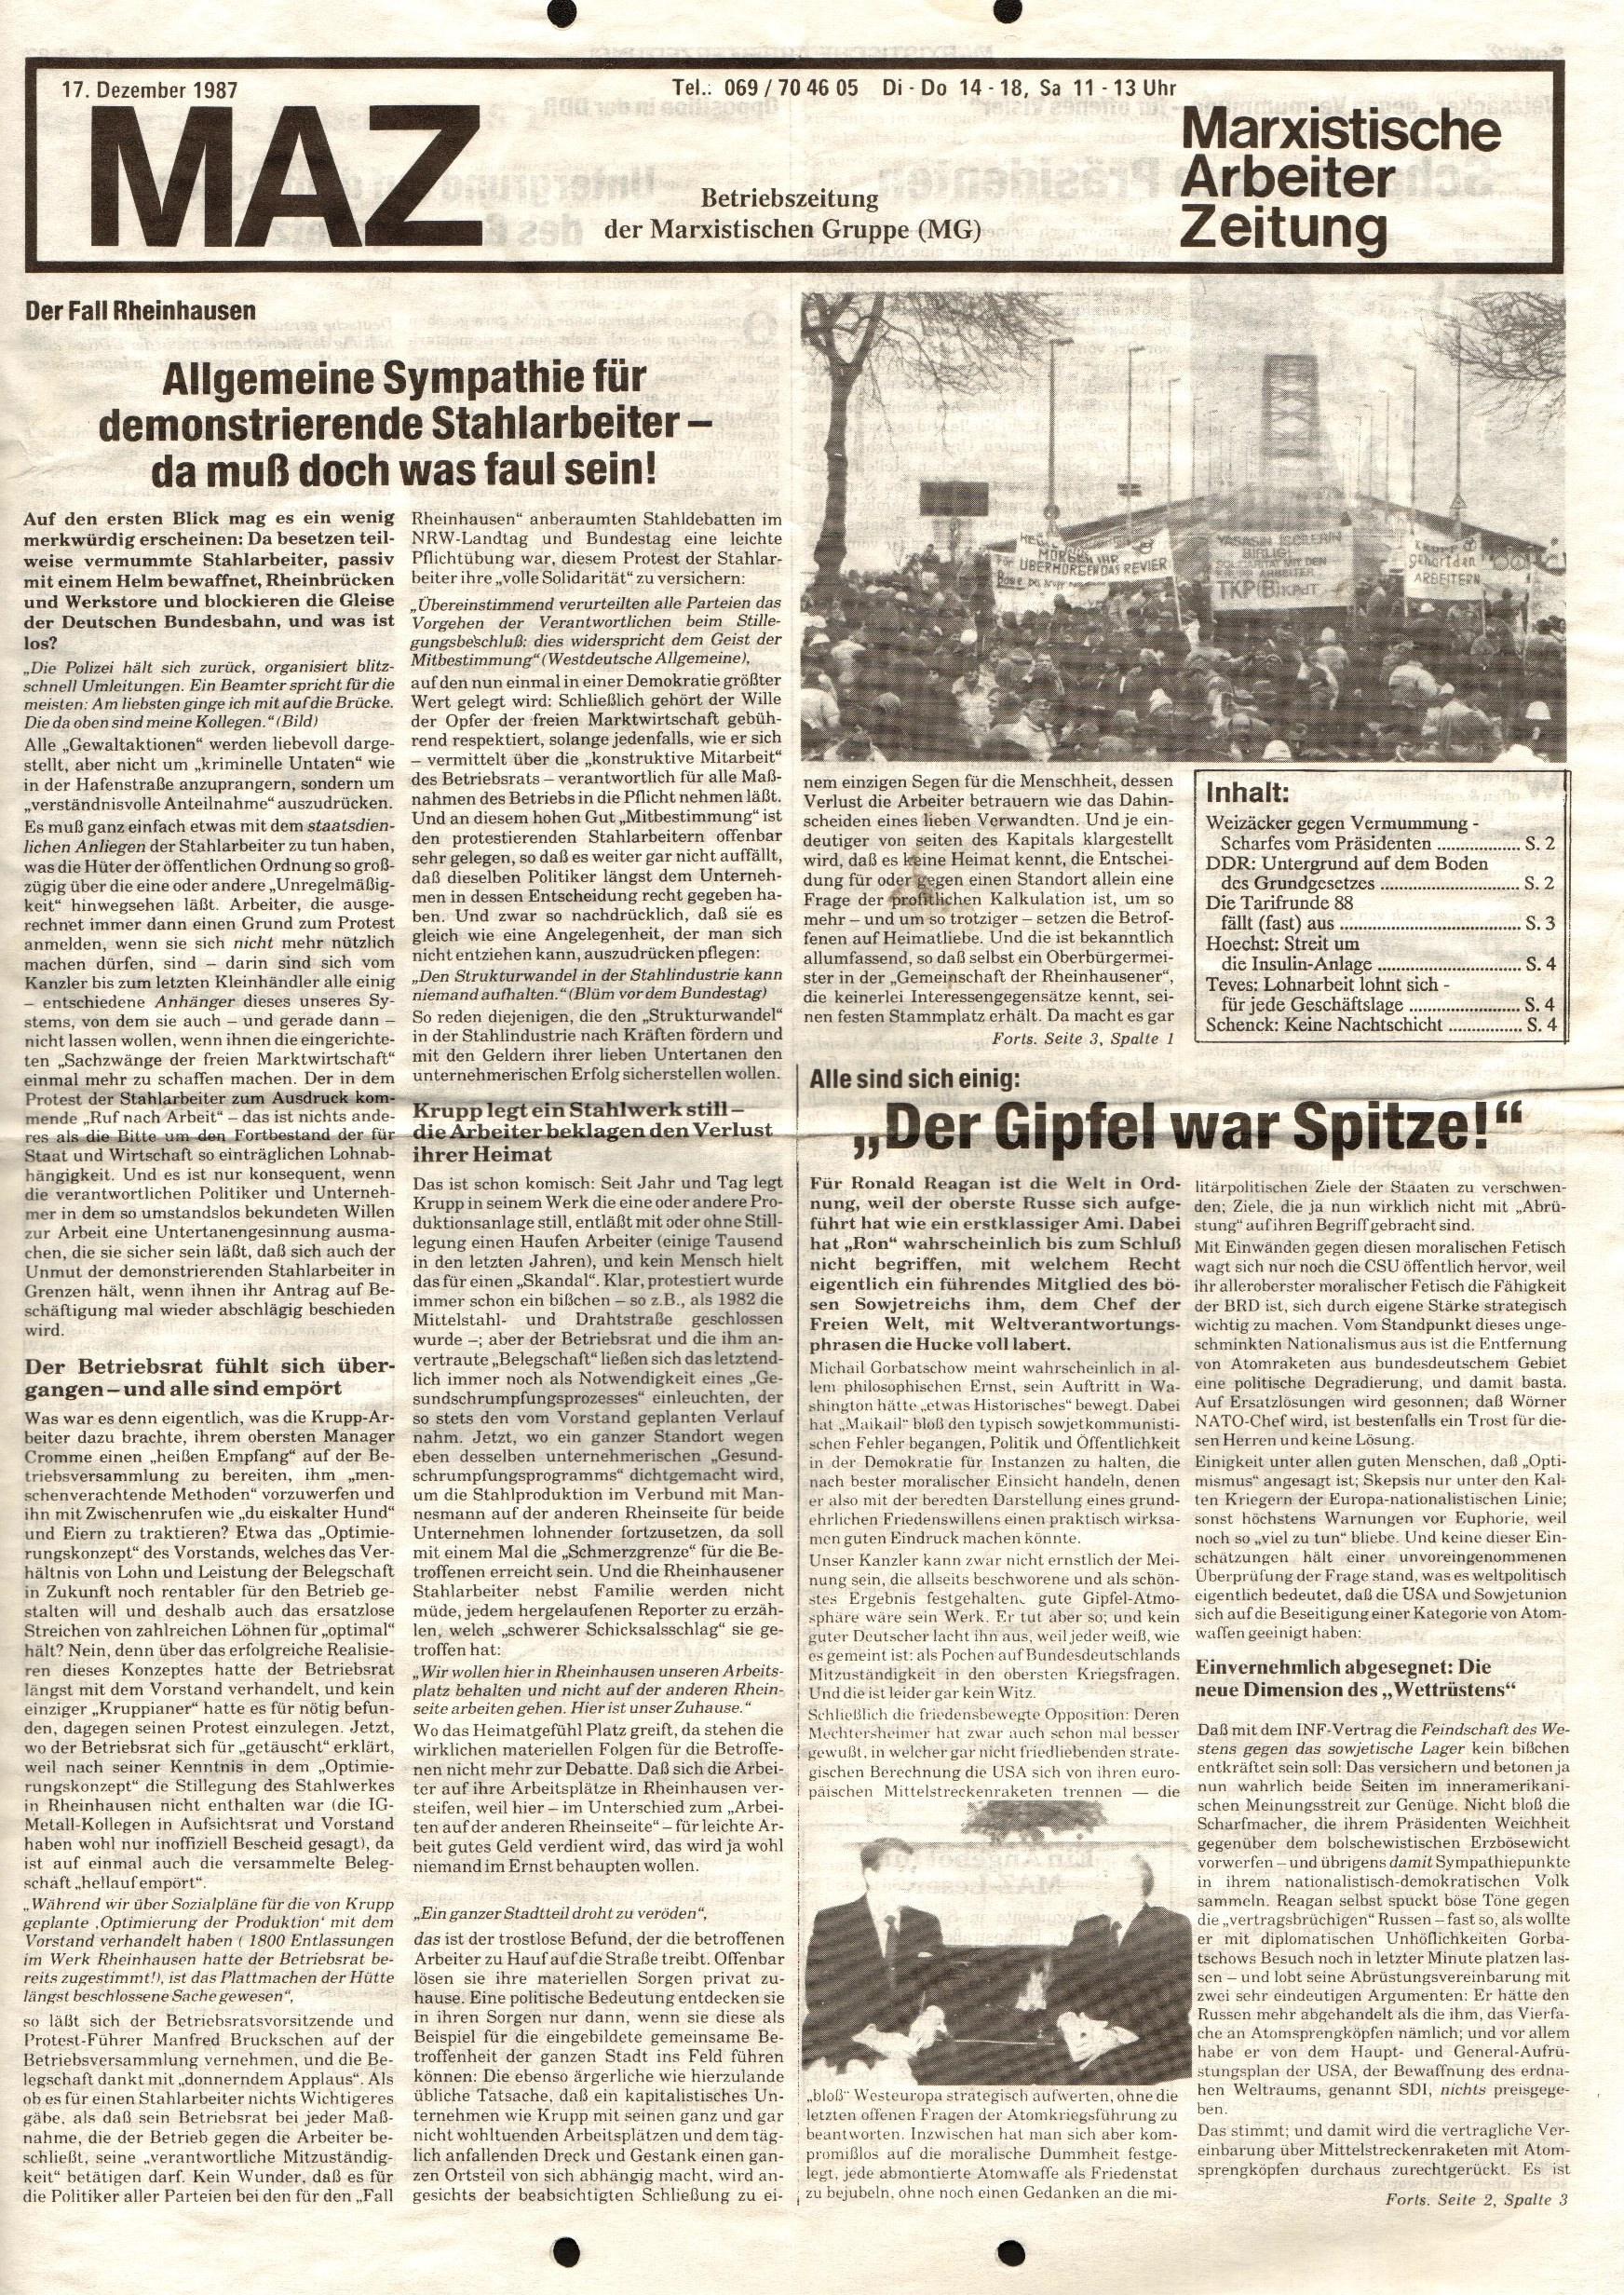 Frankfurt_CPK_Hoechst_MAZ481